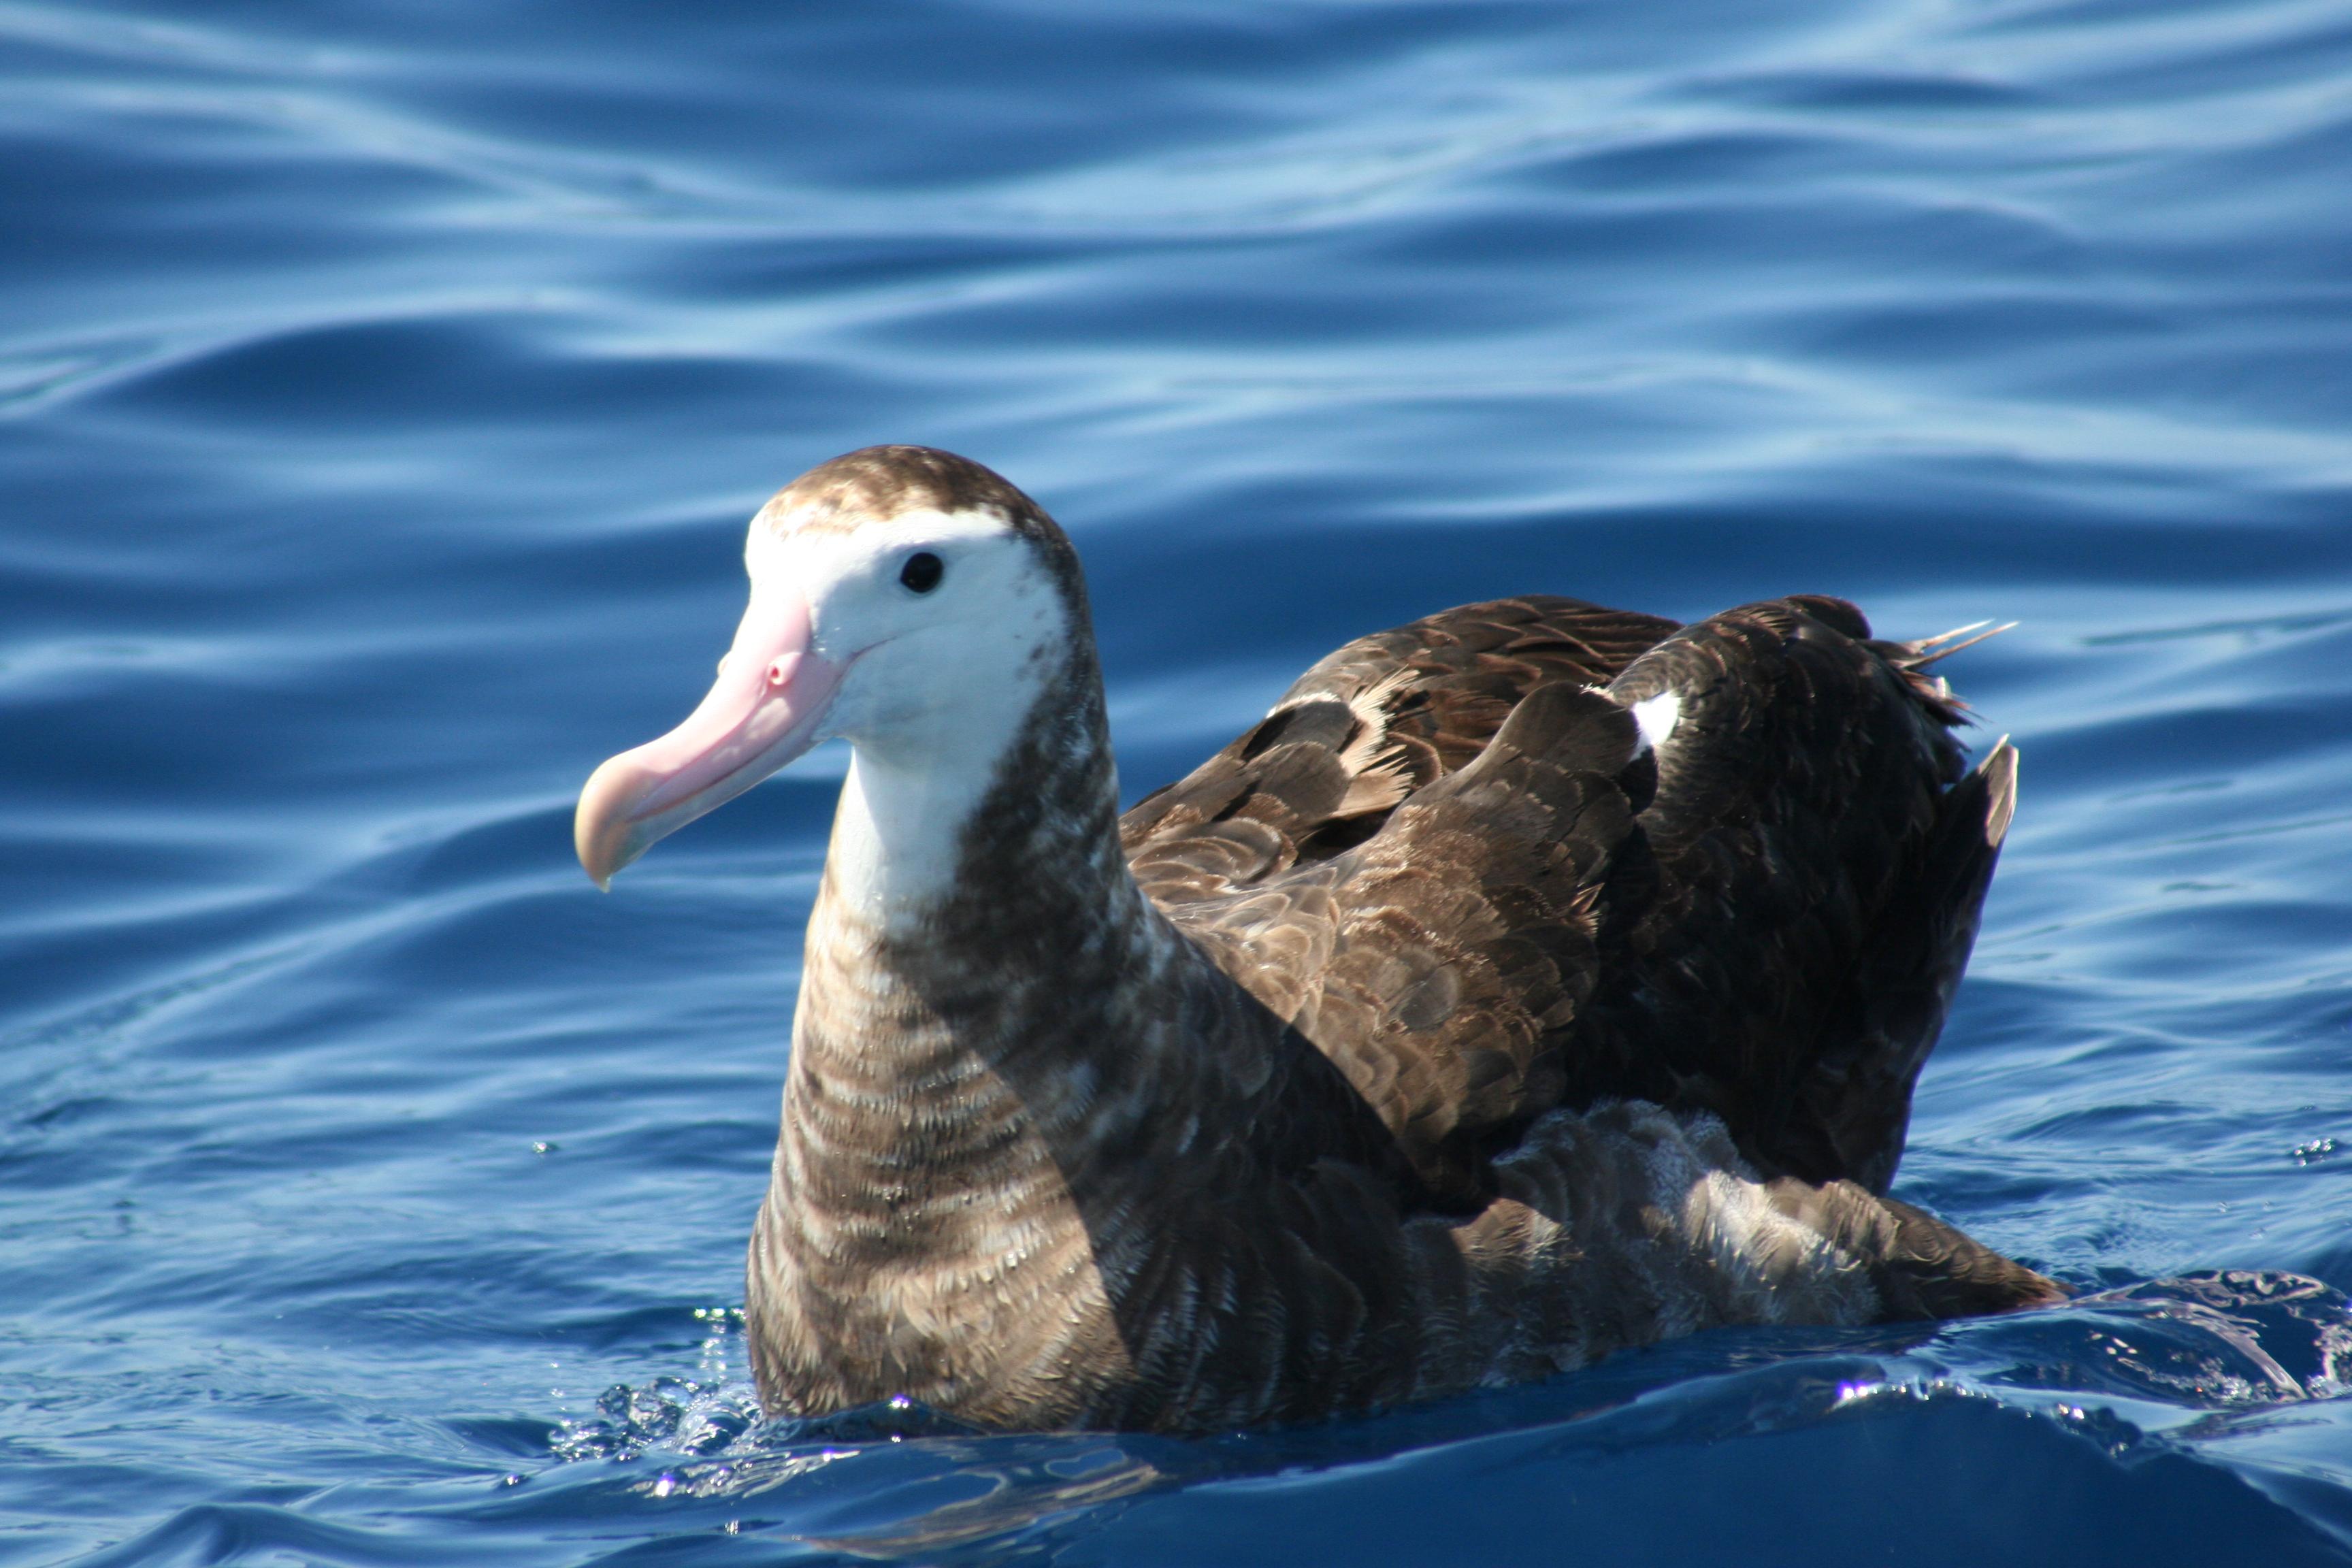 http://upload.wikimedia.org/wikipedia/commons/6/62/Gibsons_albatross.jpg